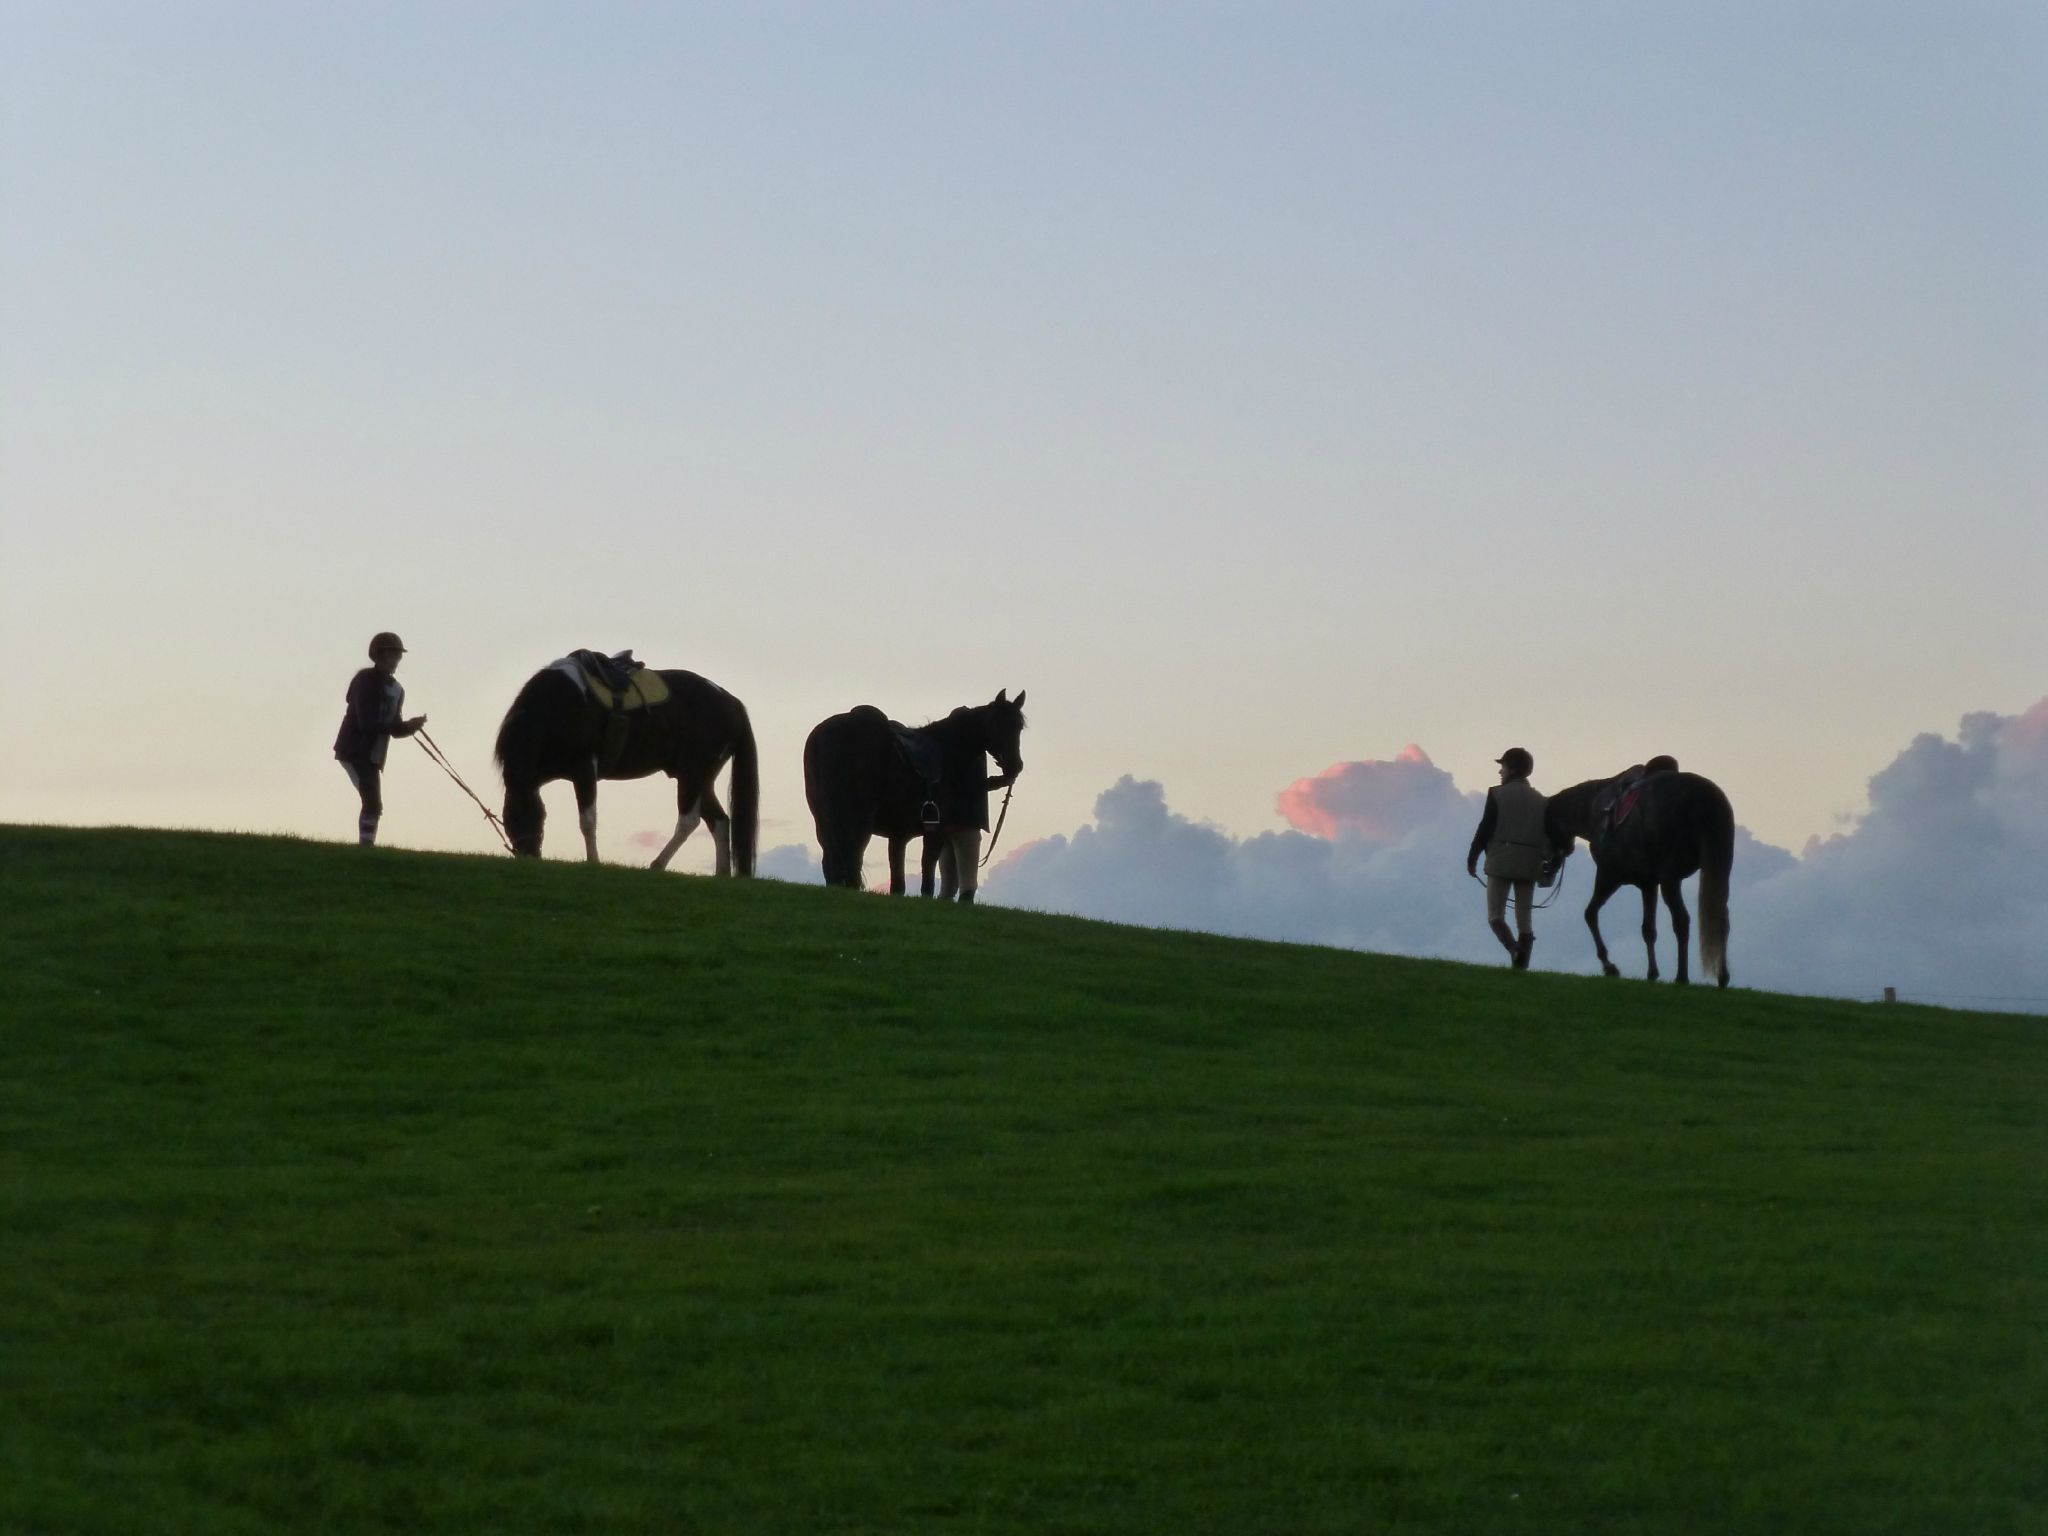 balade liberté - Mesnil Ozenne à cheval (58)